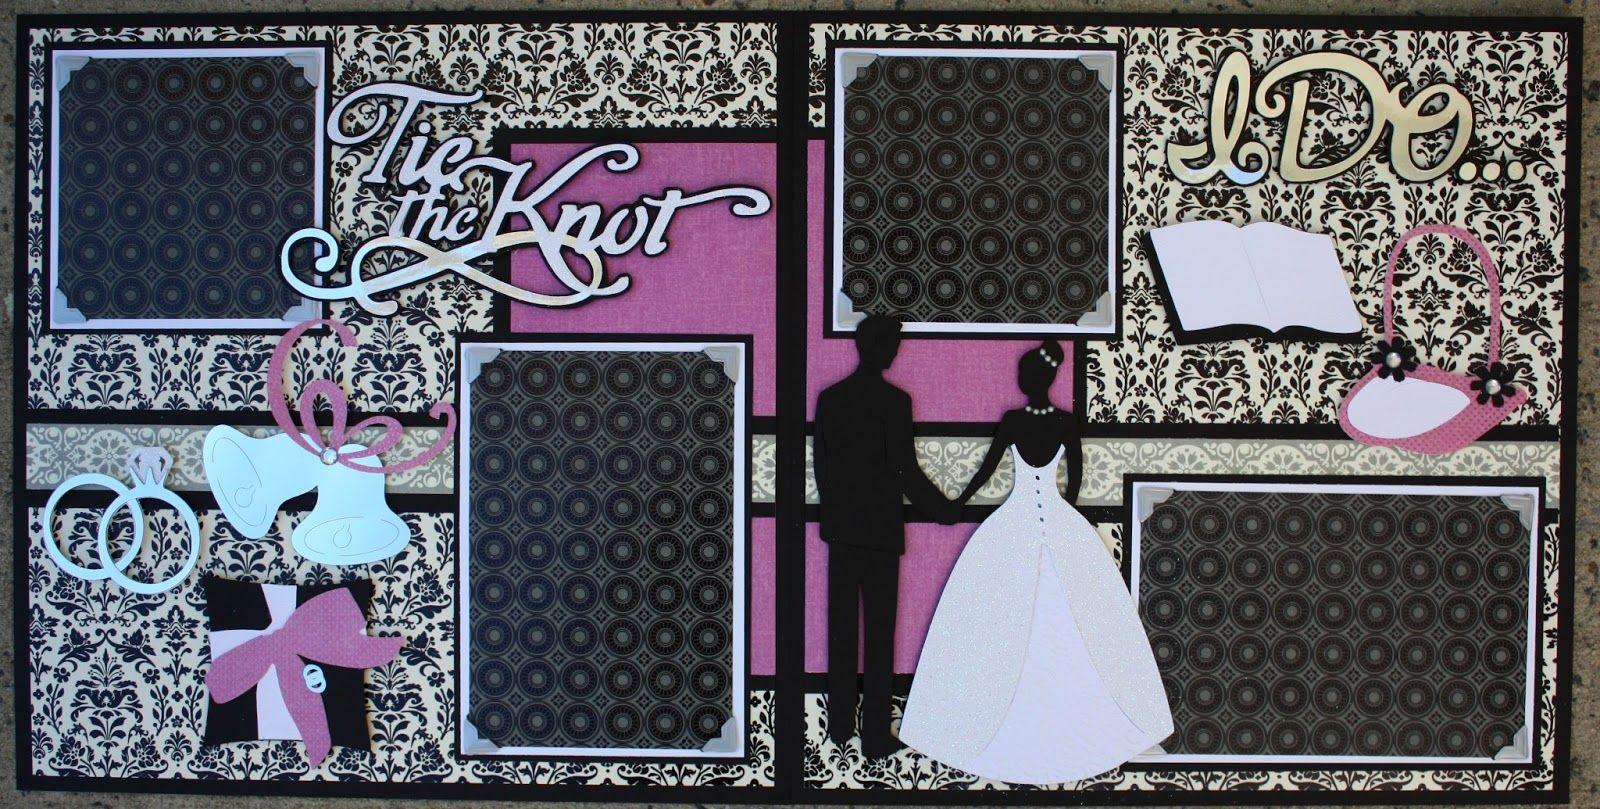 12x12 wedding scrapbook paper - Complete Wedding Album Series Tie The Knot 12x12 Double Scrapbook Layout Faith Abigail Designs